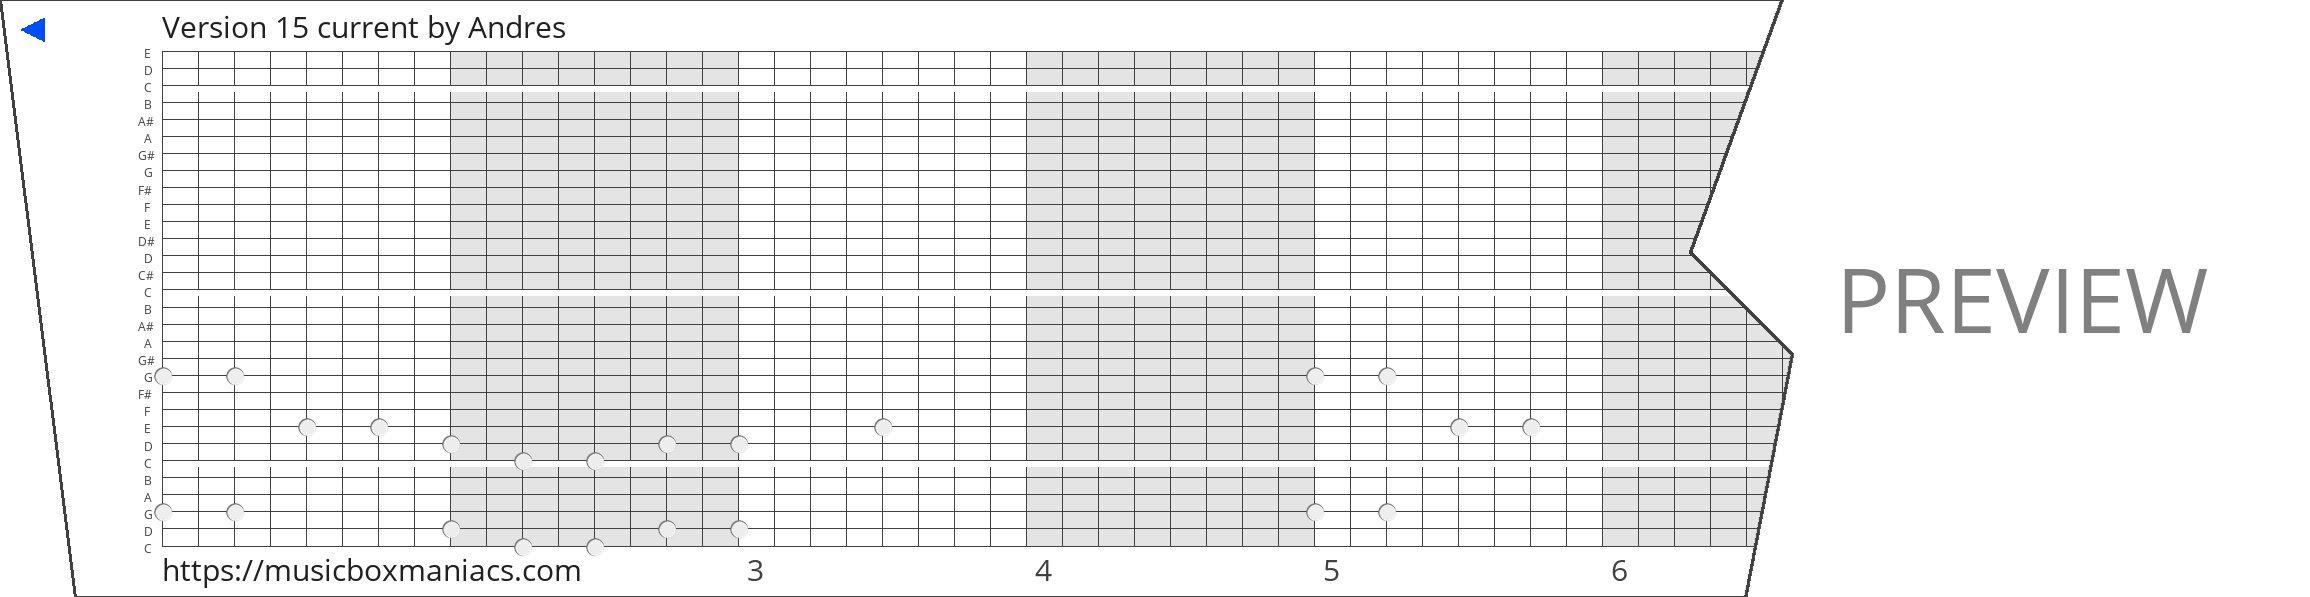 Version 15 current 30 note music box paper strip